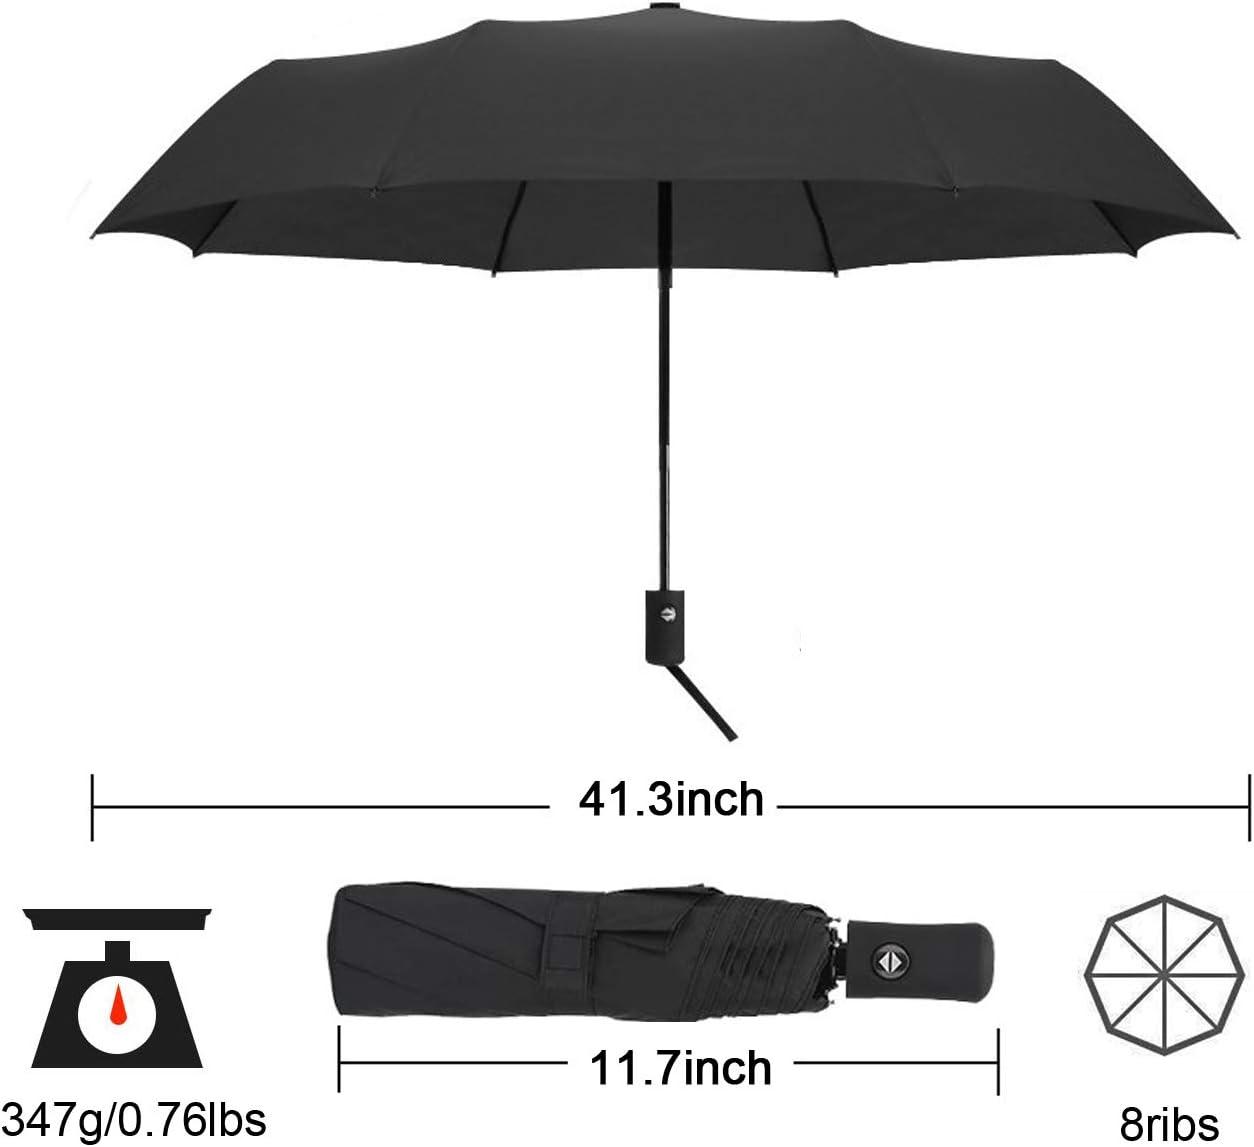 Black Travel Umbrella Auto Open//Close ǀ Windproof ǀ Compact Reinforced ǀ Portable 8 Ribs Construction Umbrella for Men /& Women 11.8 Inch